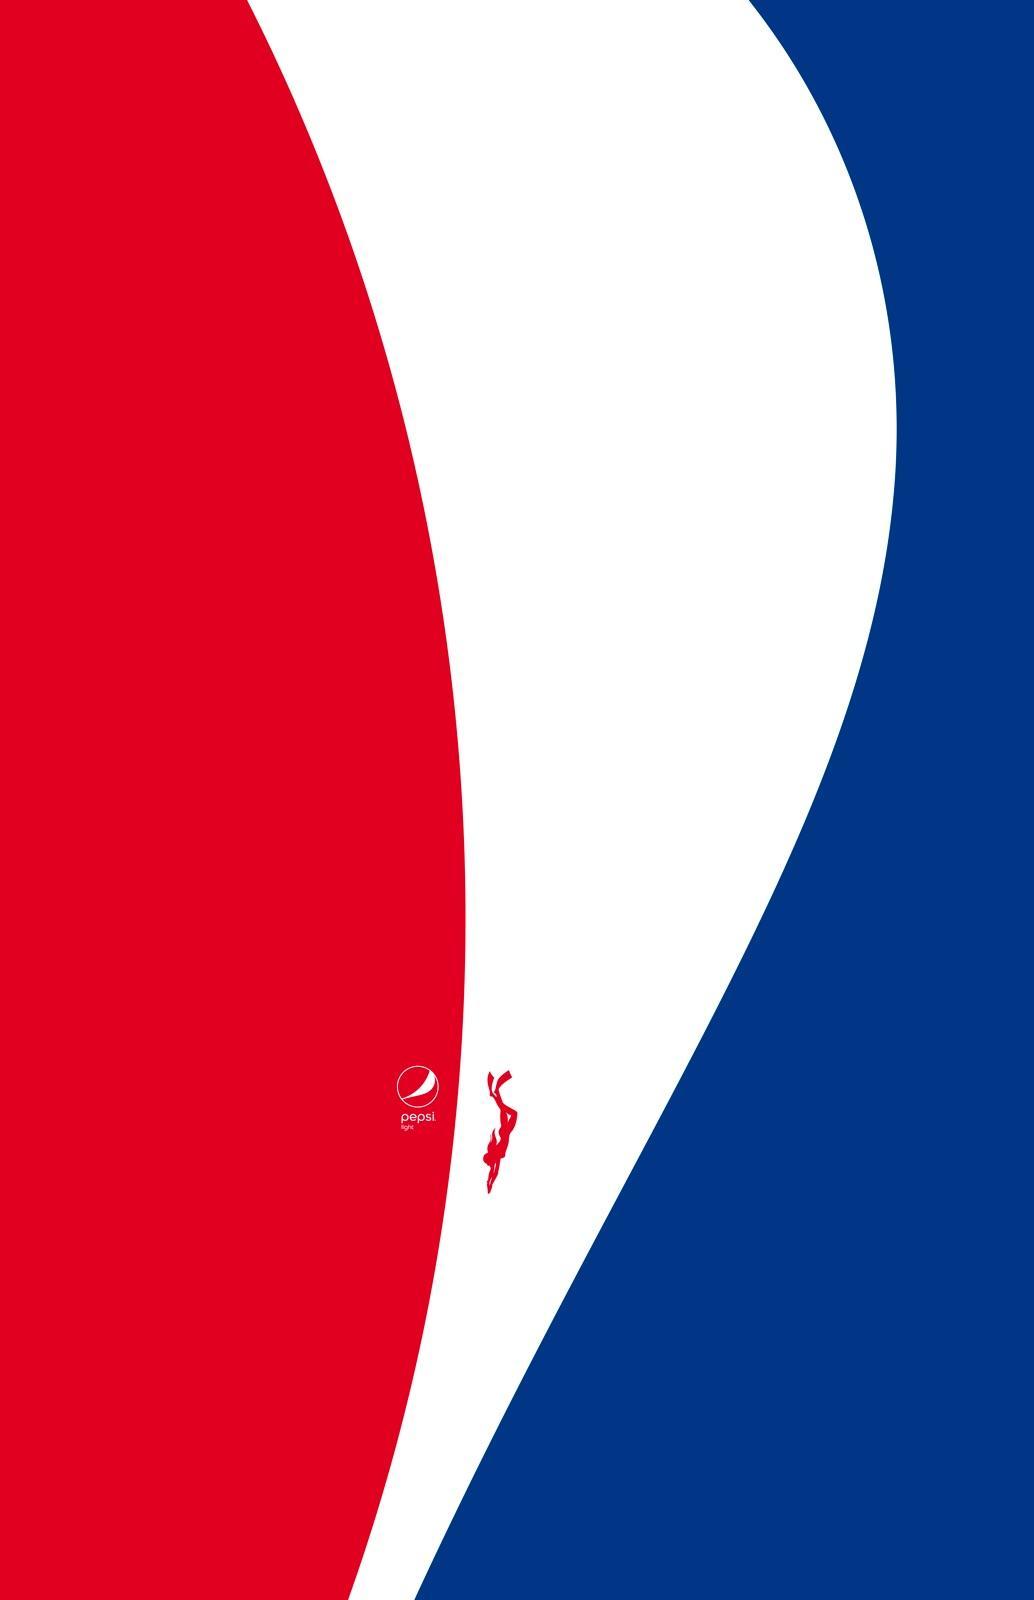 Pepsi Print Ad - Feel Light - Pnea